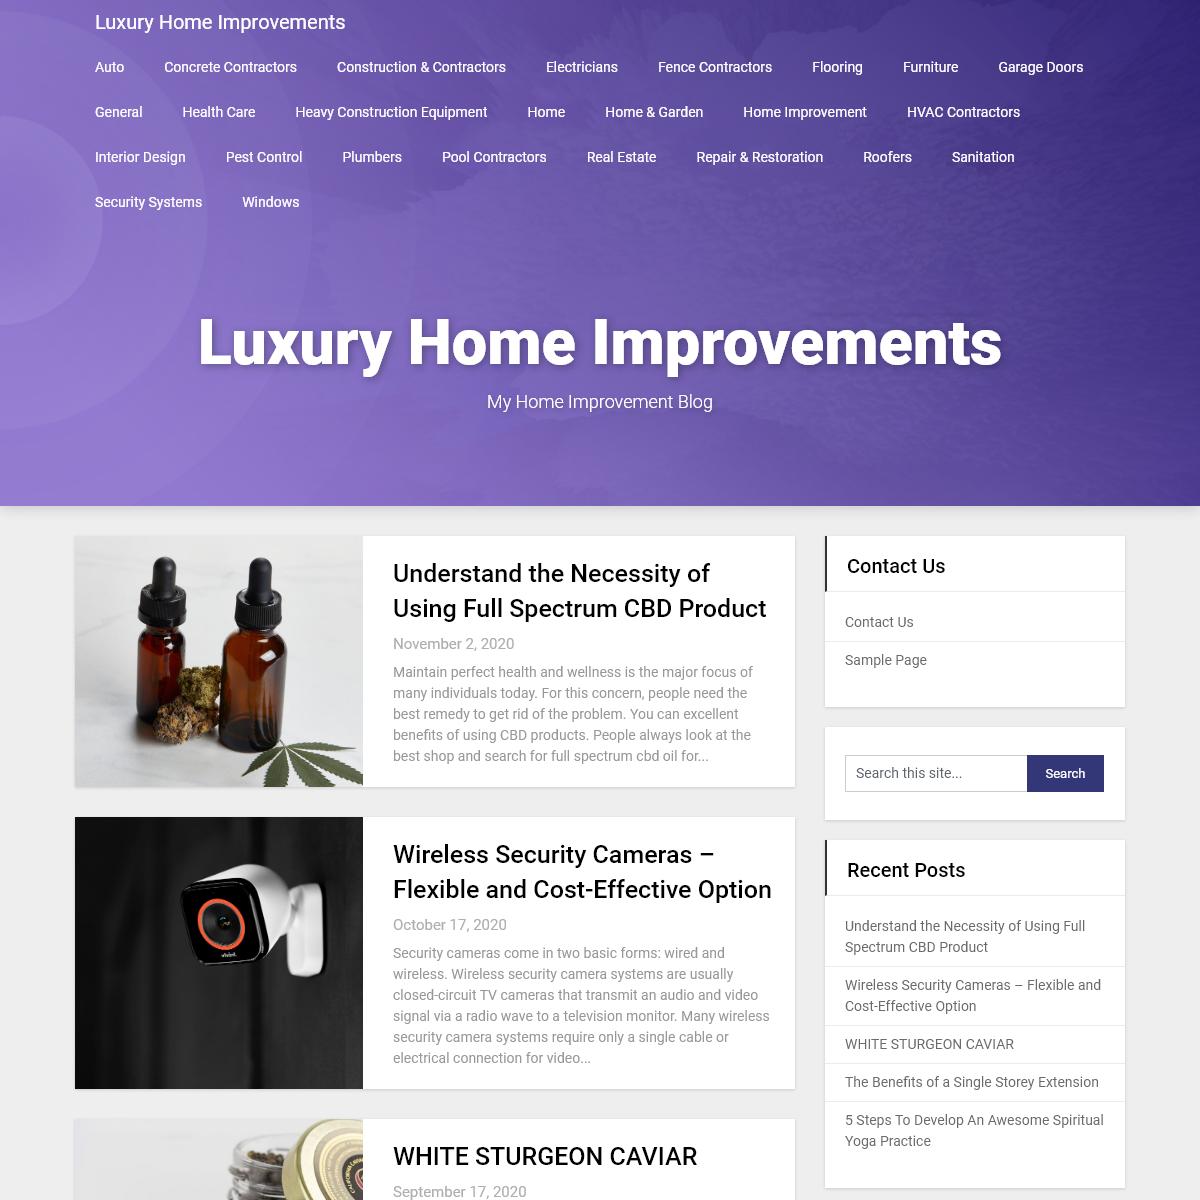 Luxury Home Improvements – My Home Improvement Blog